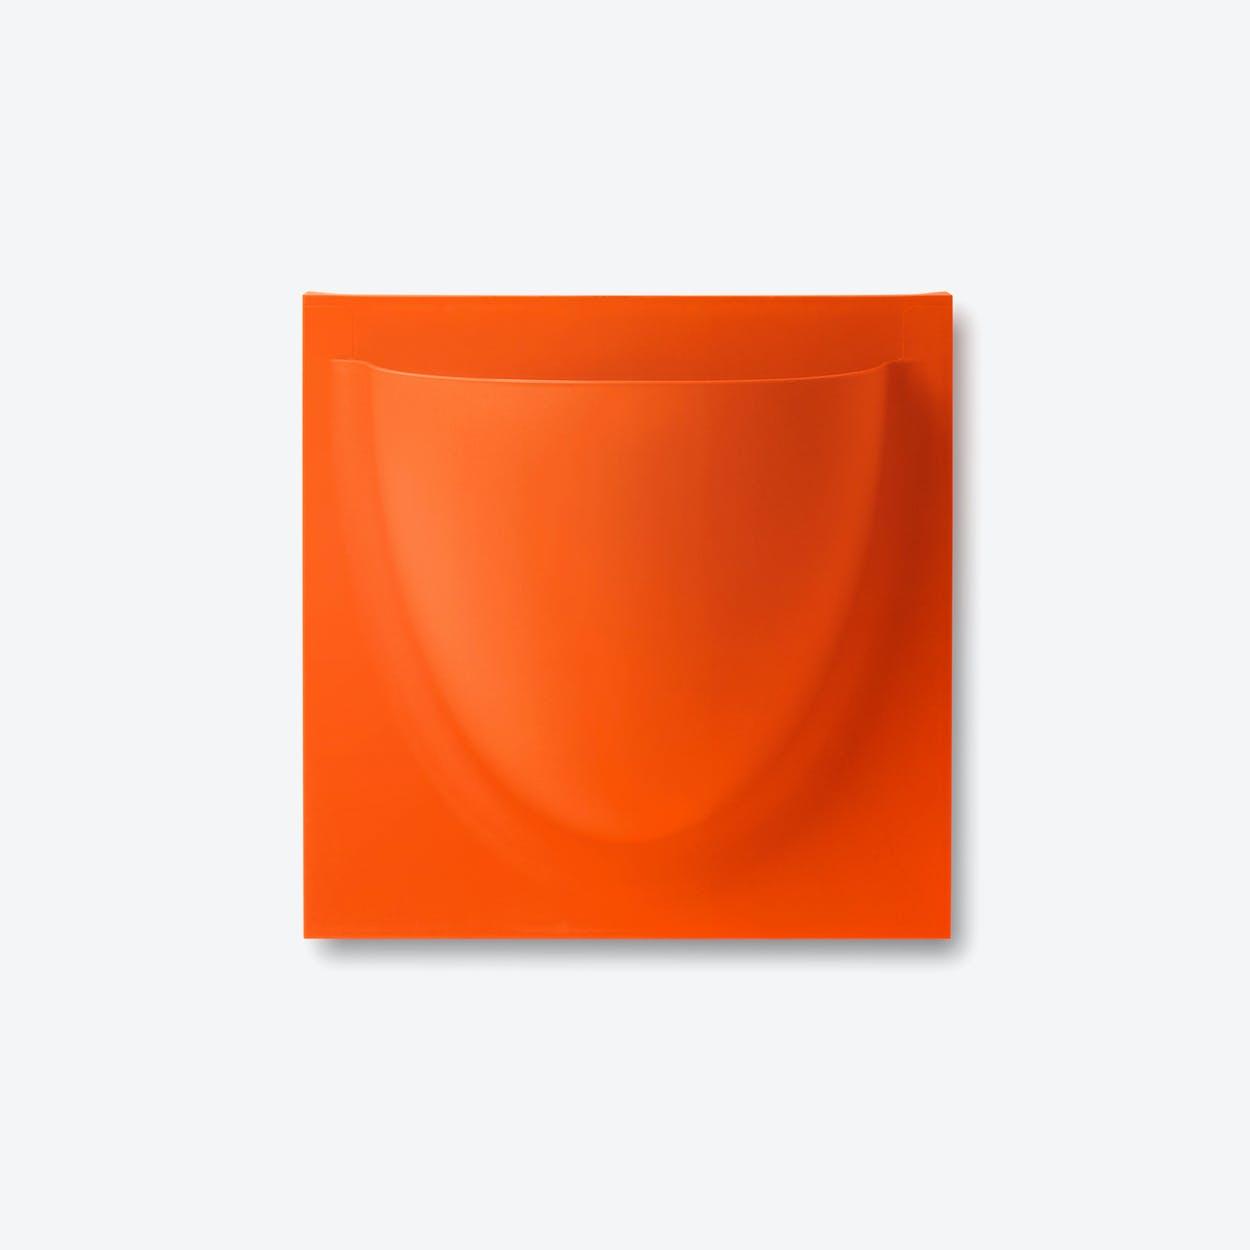 Wall Planter / Jar Mini in Orange (Set of 2)